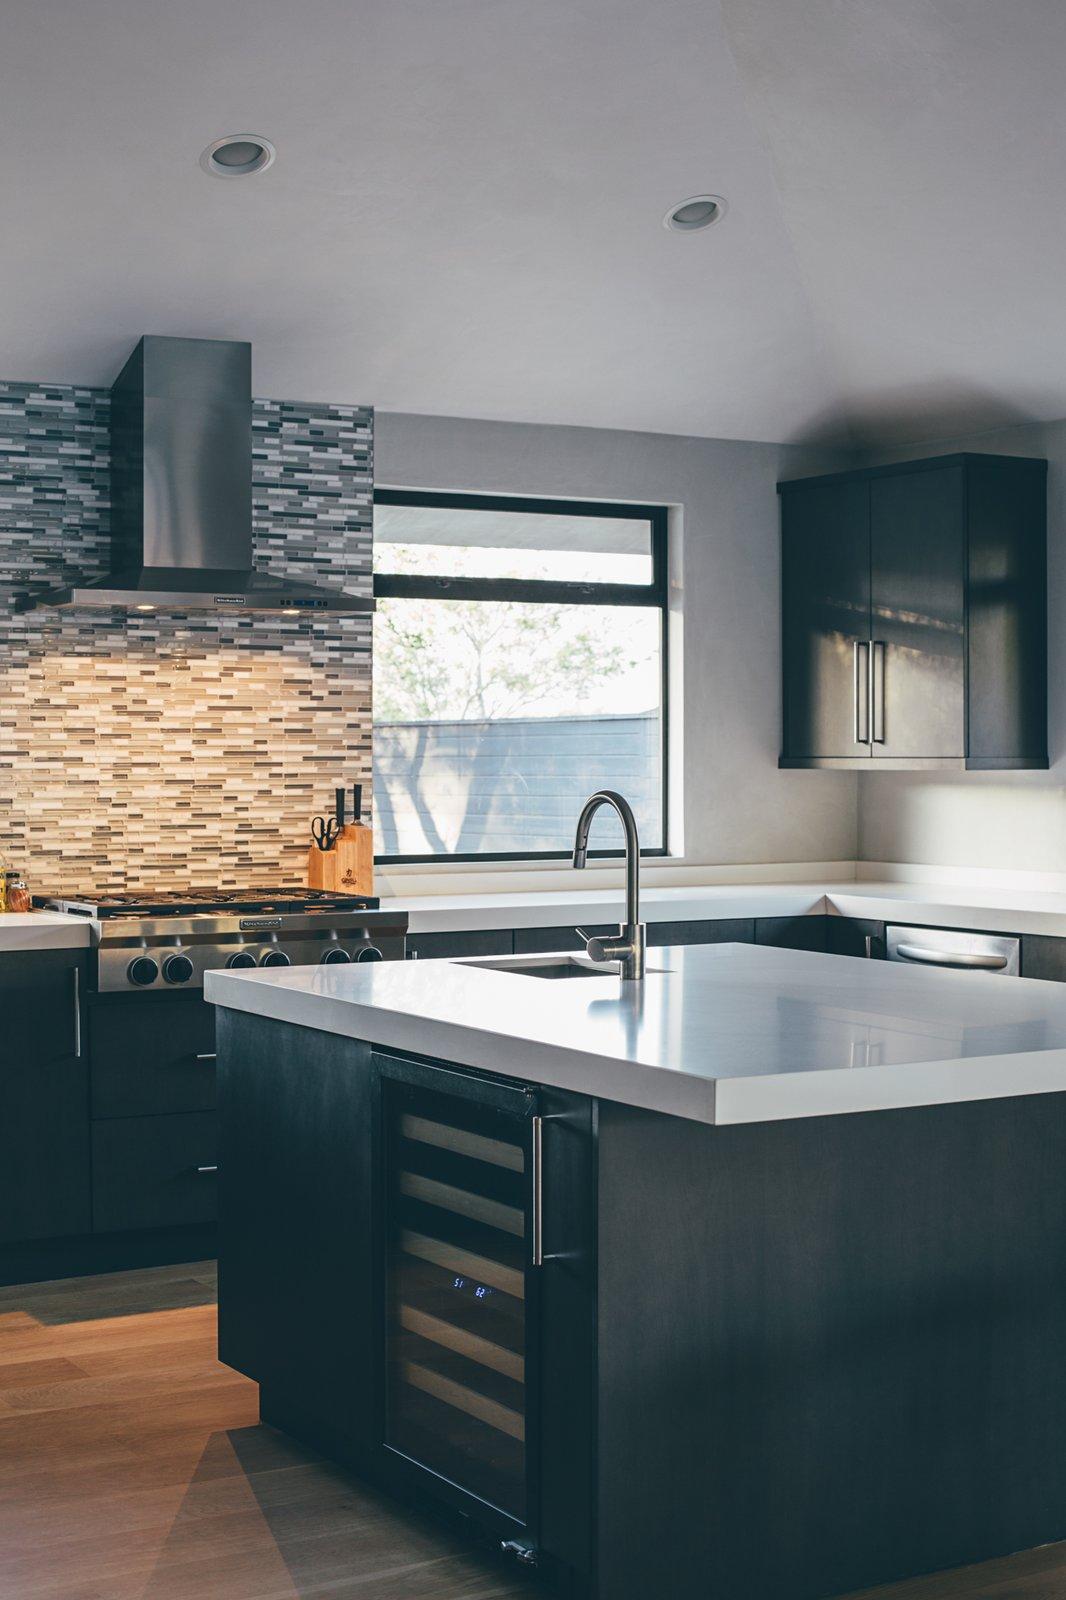 Tagged: Kitchen, Concrete Counter, Medium Hardwood Floor, Recessed Lighting, Glass Tile Backsplashe, Undermount Sink, and Wine Cooler.  Crestline by ANACAPA